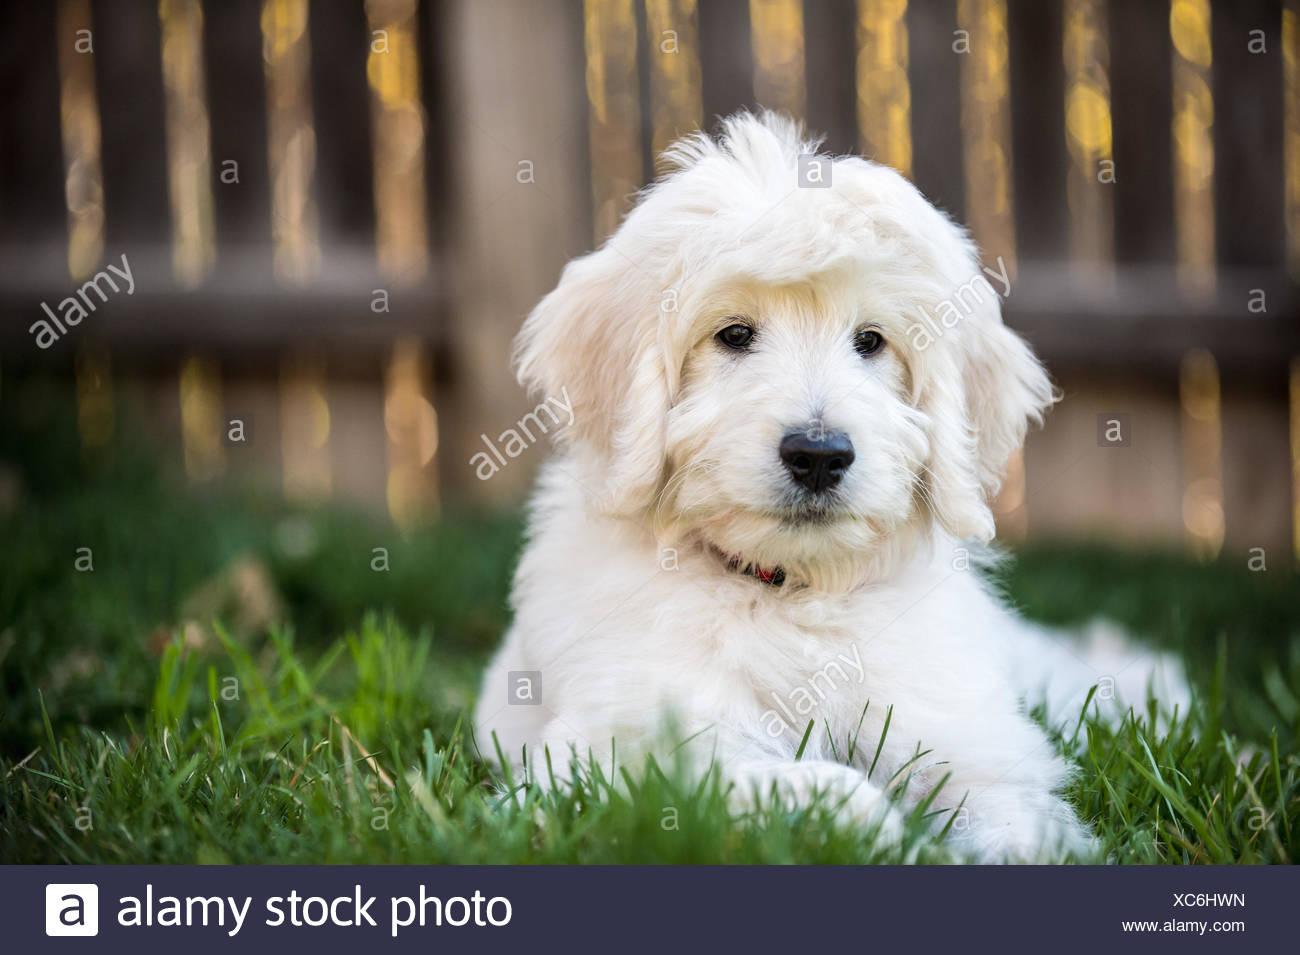 Portrait Of English Goldendoodle Puppy Stock Photo 282887521 Alamy